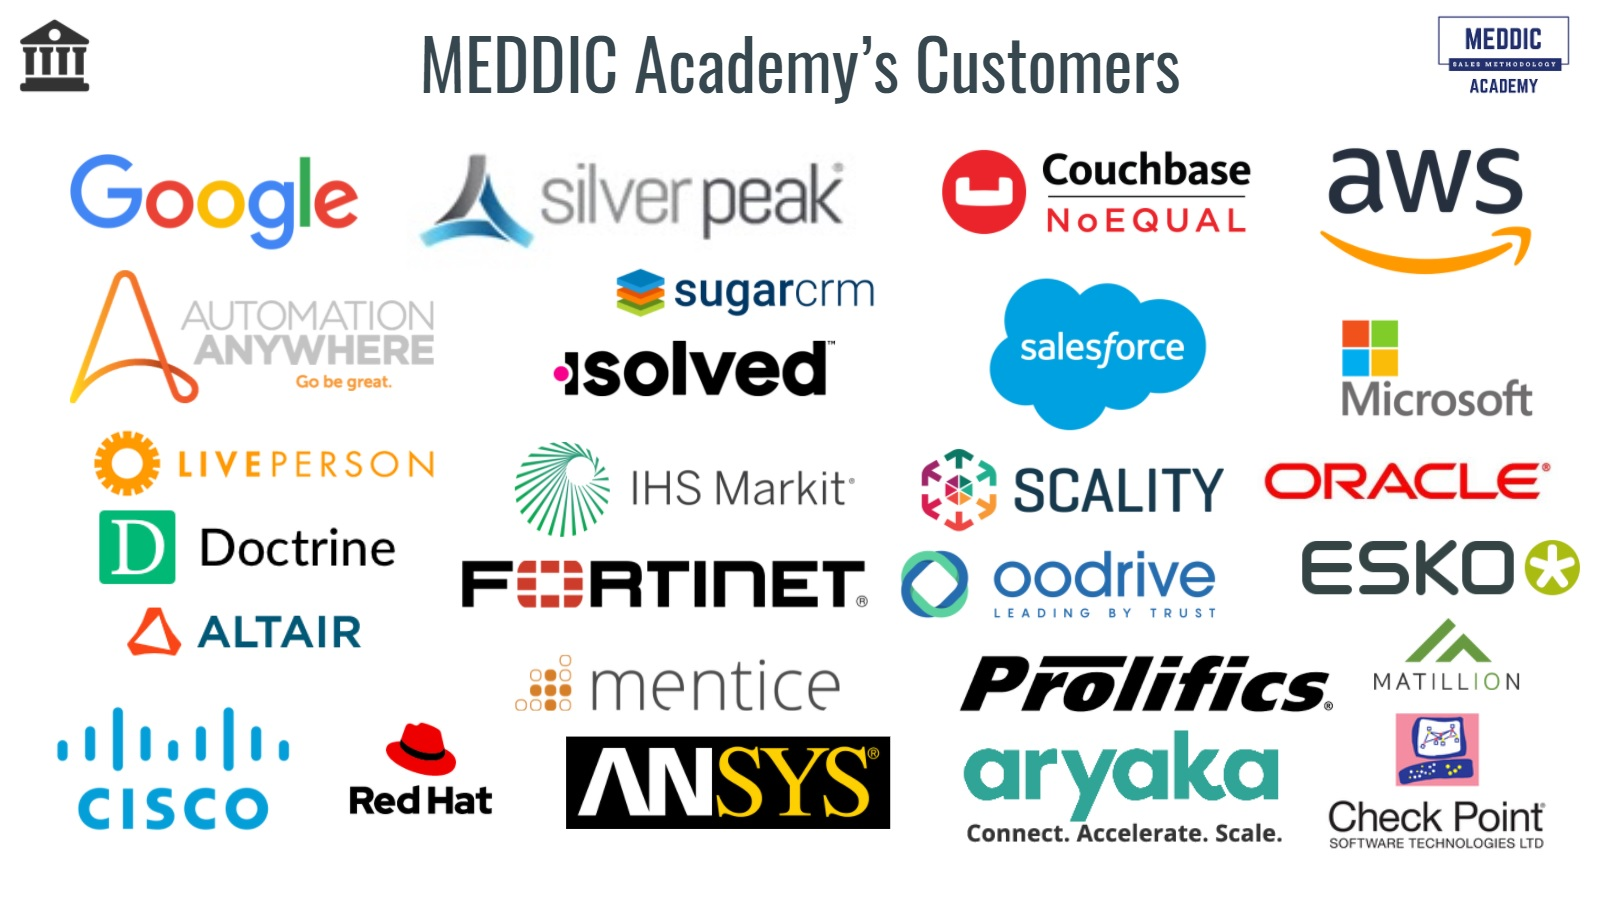 MEDDIC-MEDDPICC-Google-Amazon-Oracle-Microsoft-salesforce